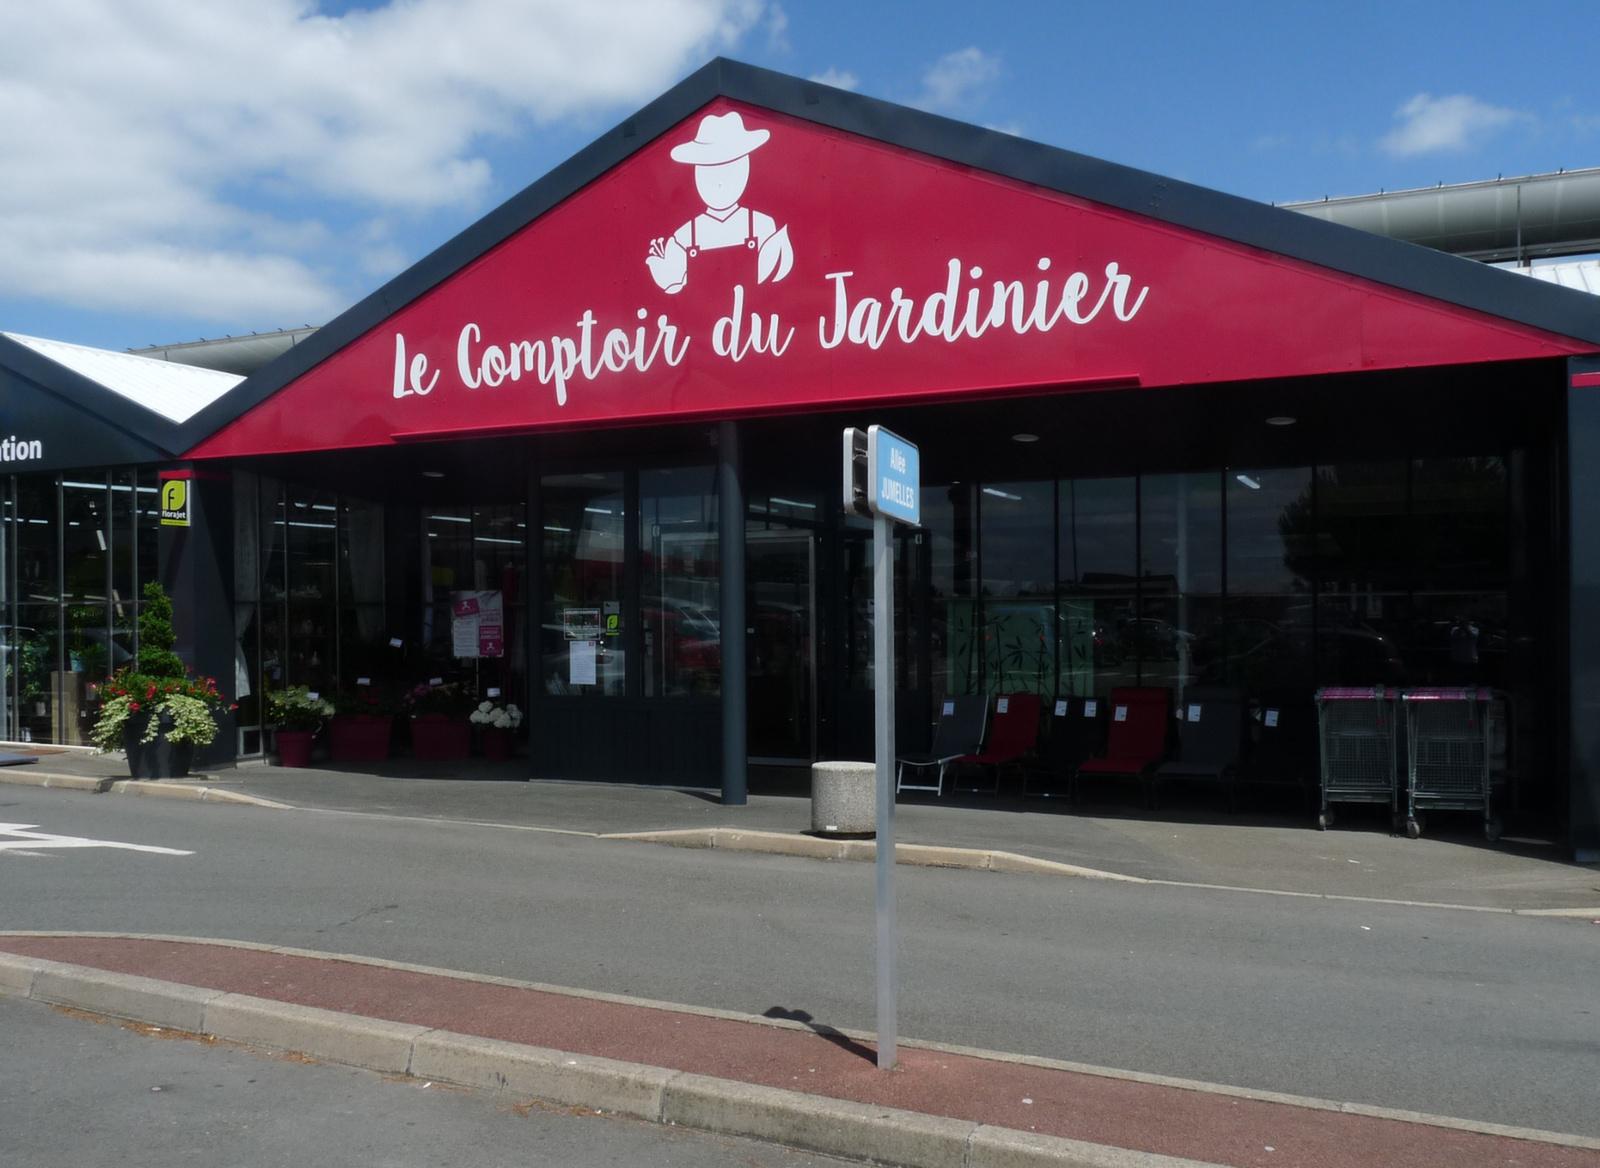 LE COMPTOIR DU JARDINIER